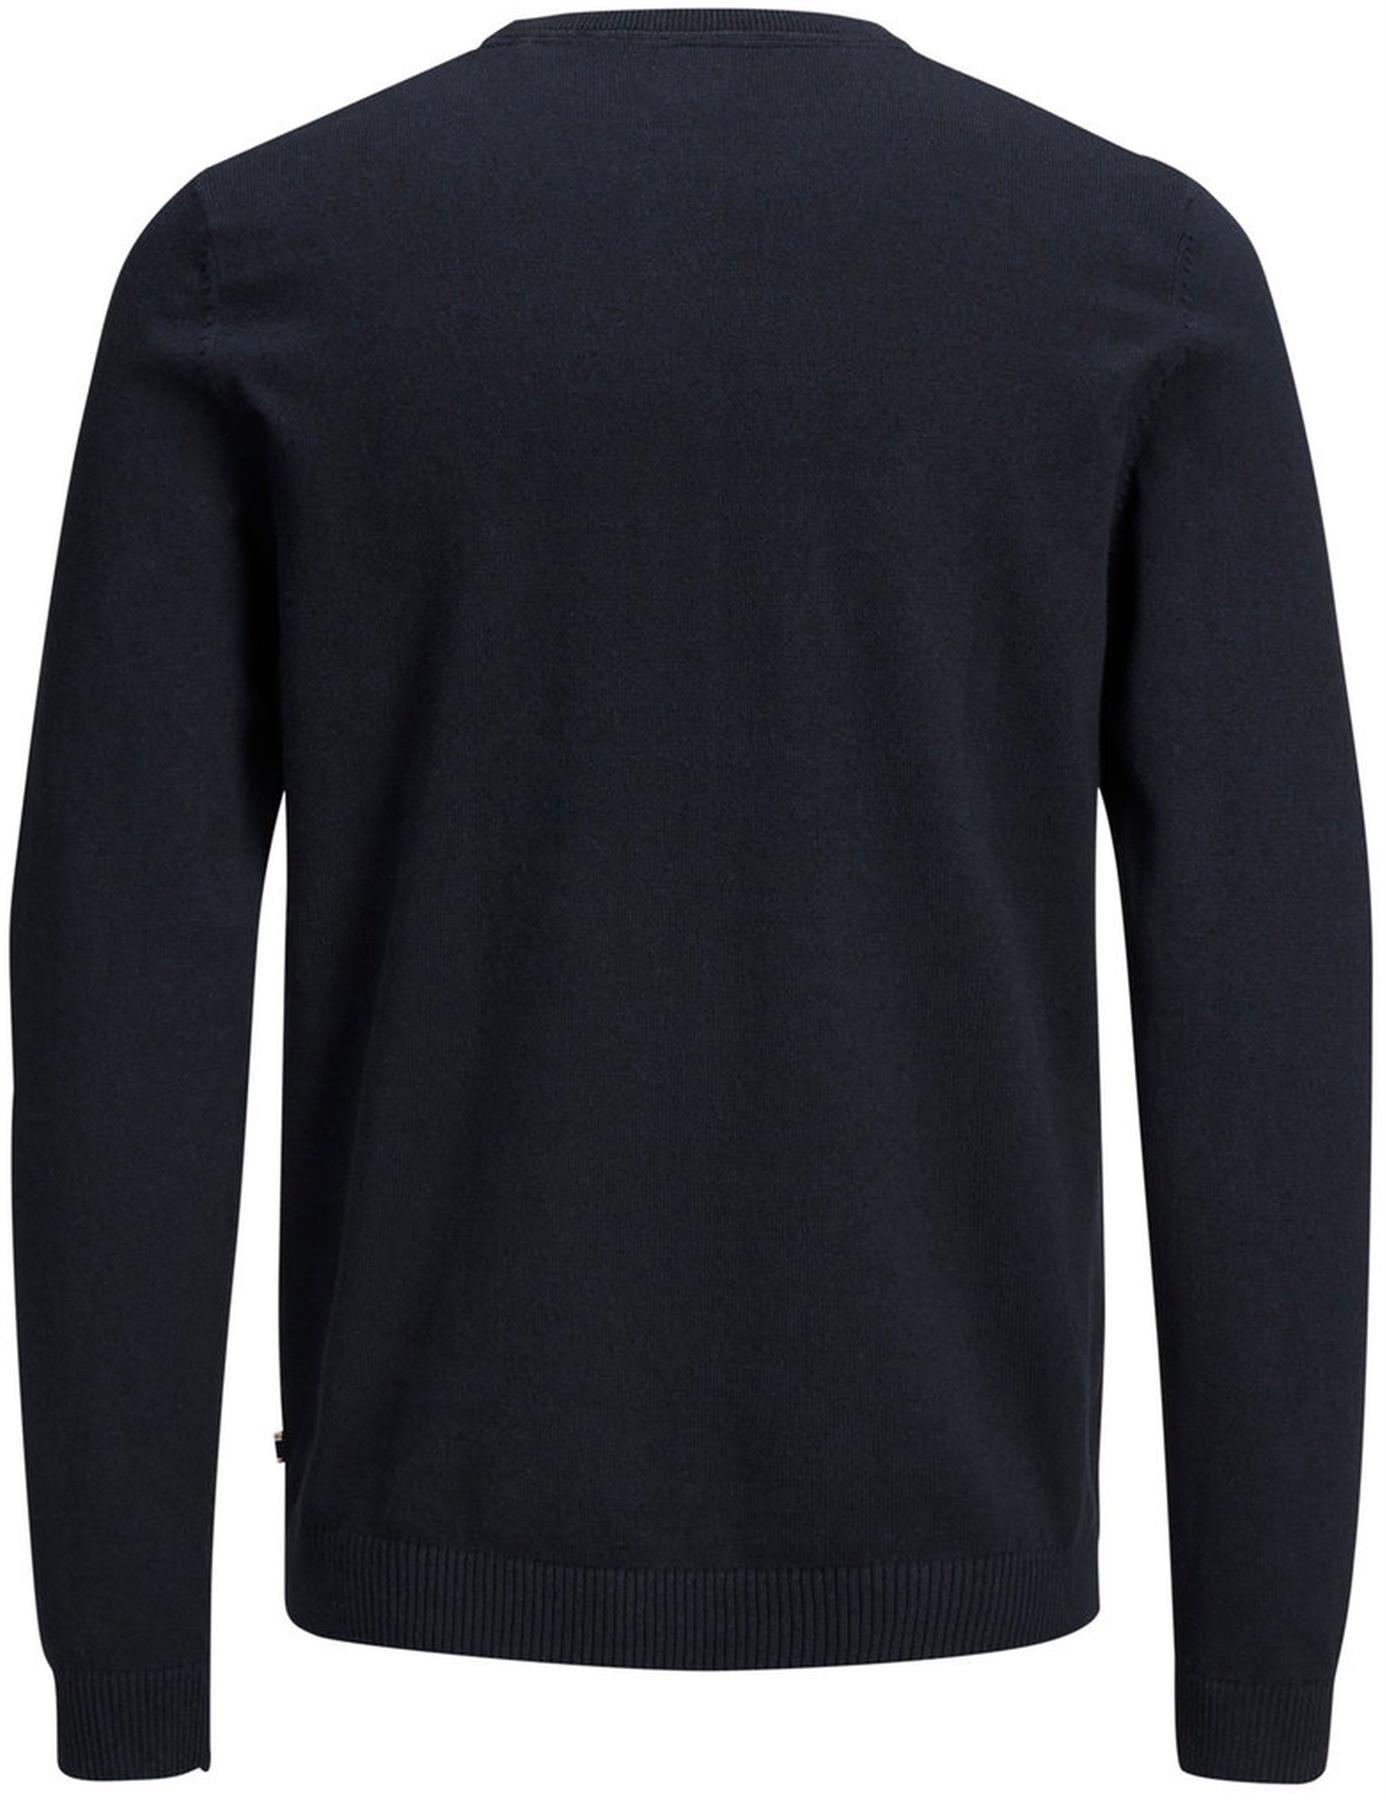 Jack-amp-Jones-Jumpers-Sweaters-Cardigans-Assorted-S-XXL miniatuur 20